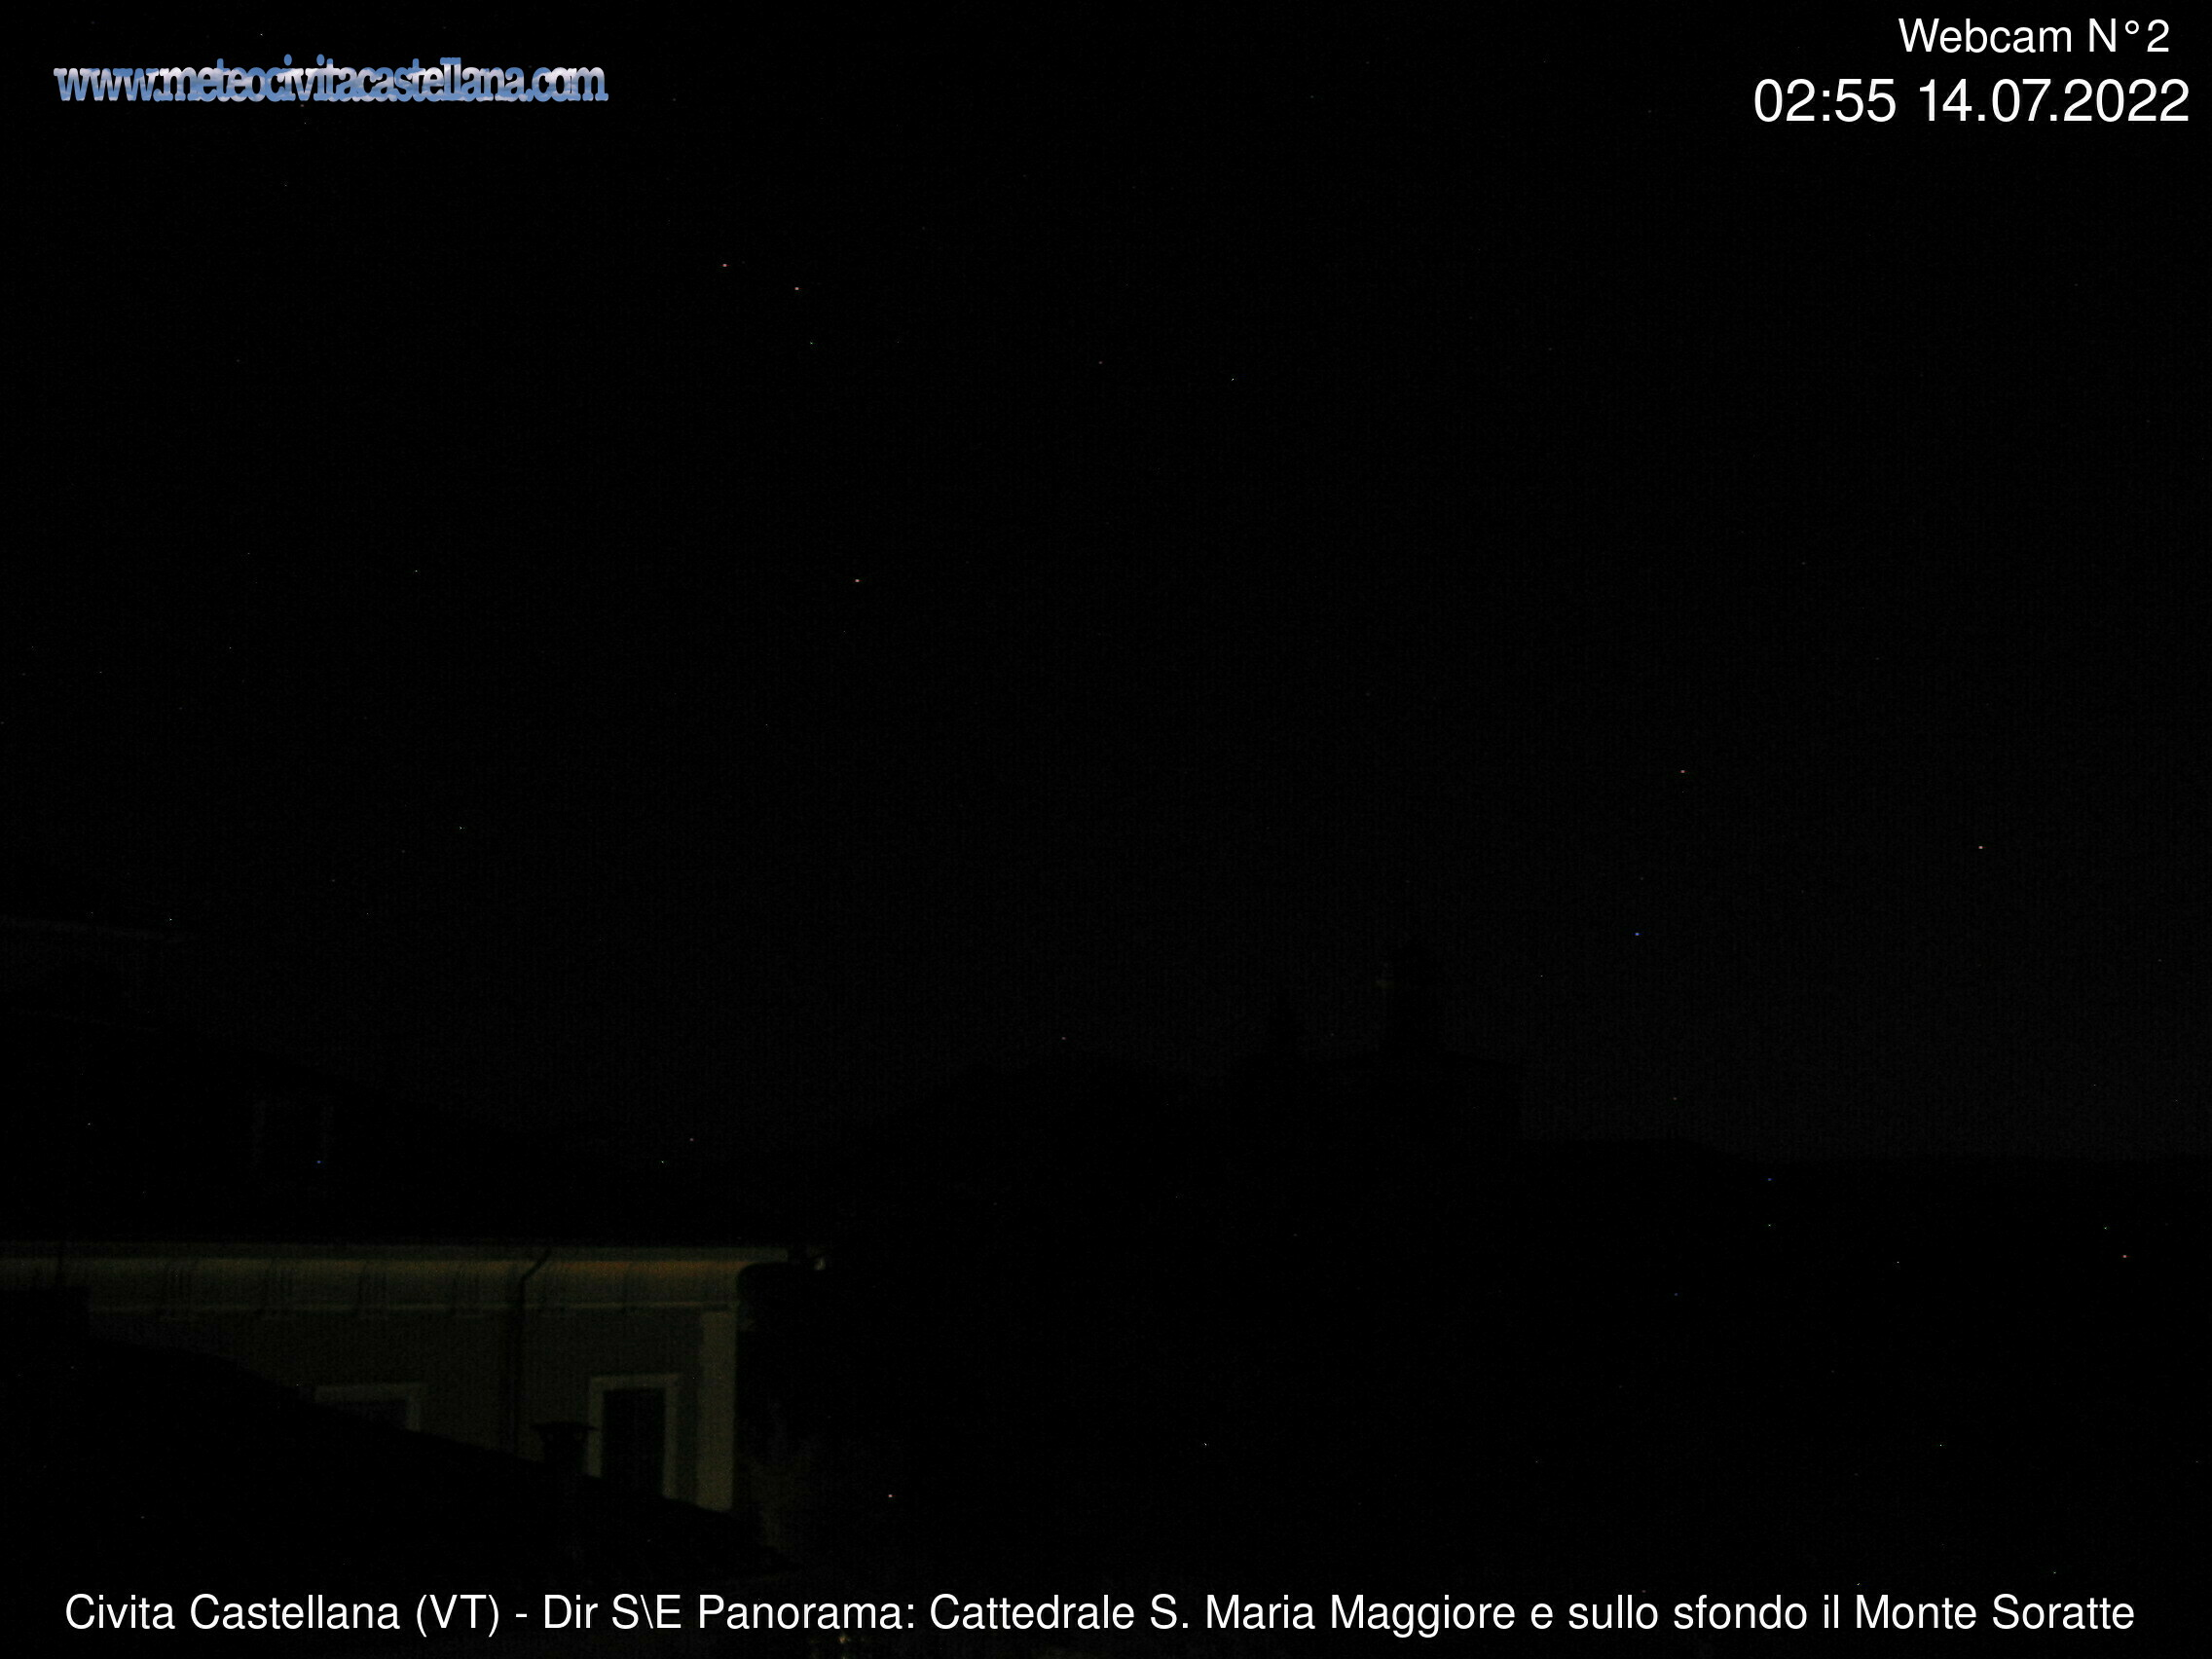 Civita Castellana Fri. 02:58